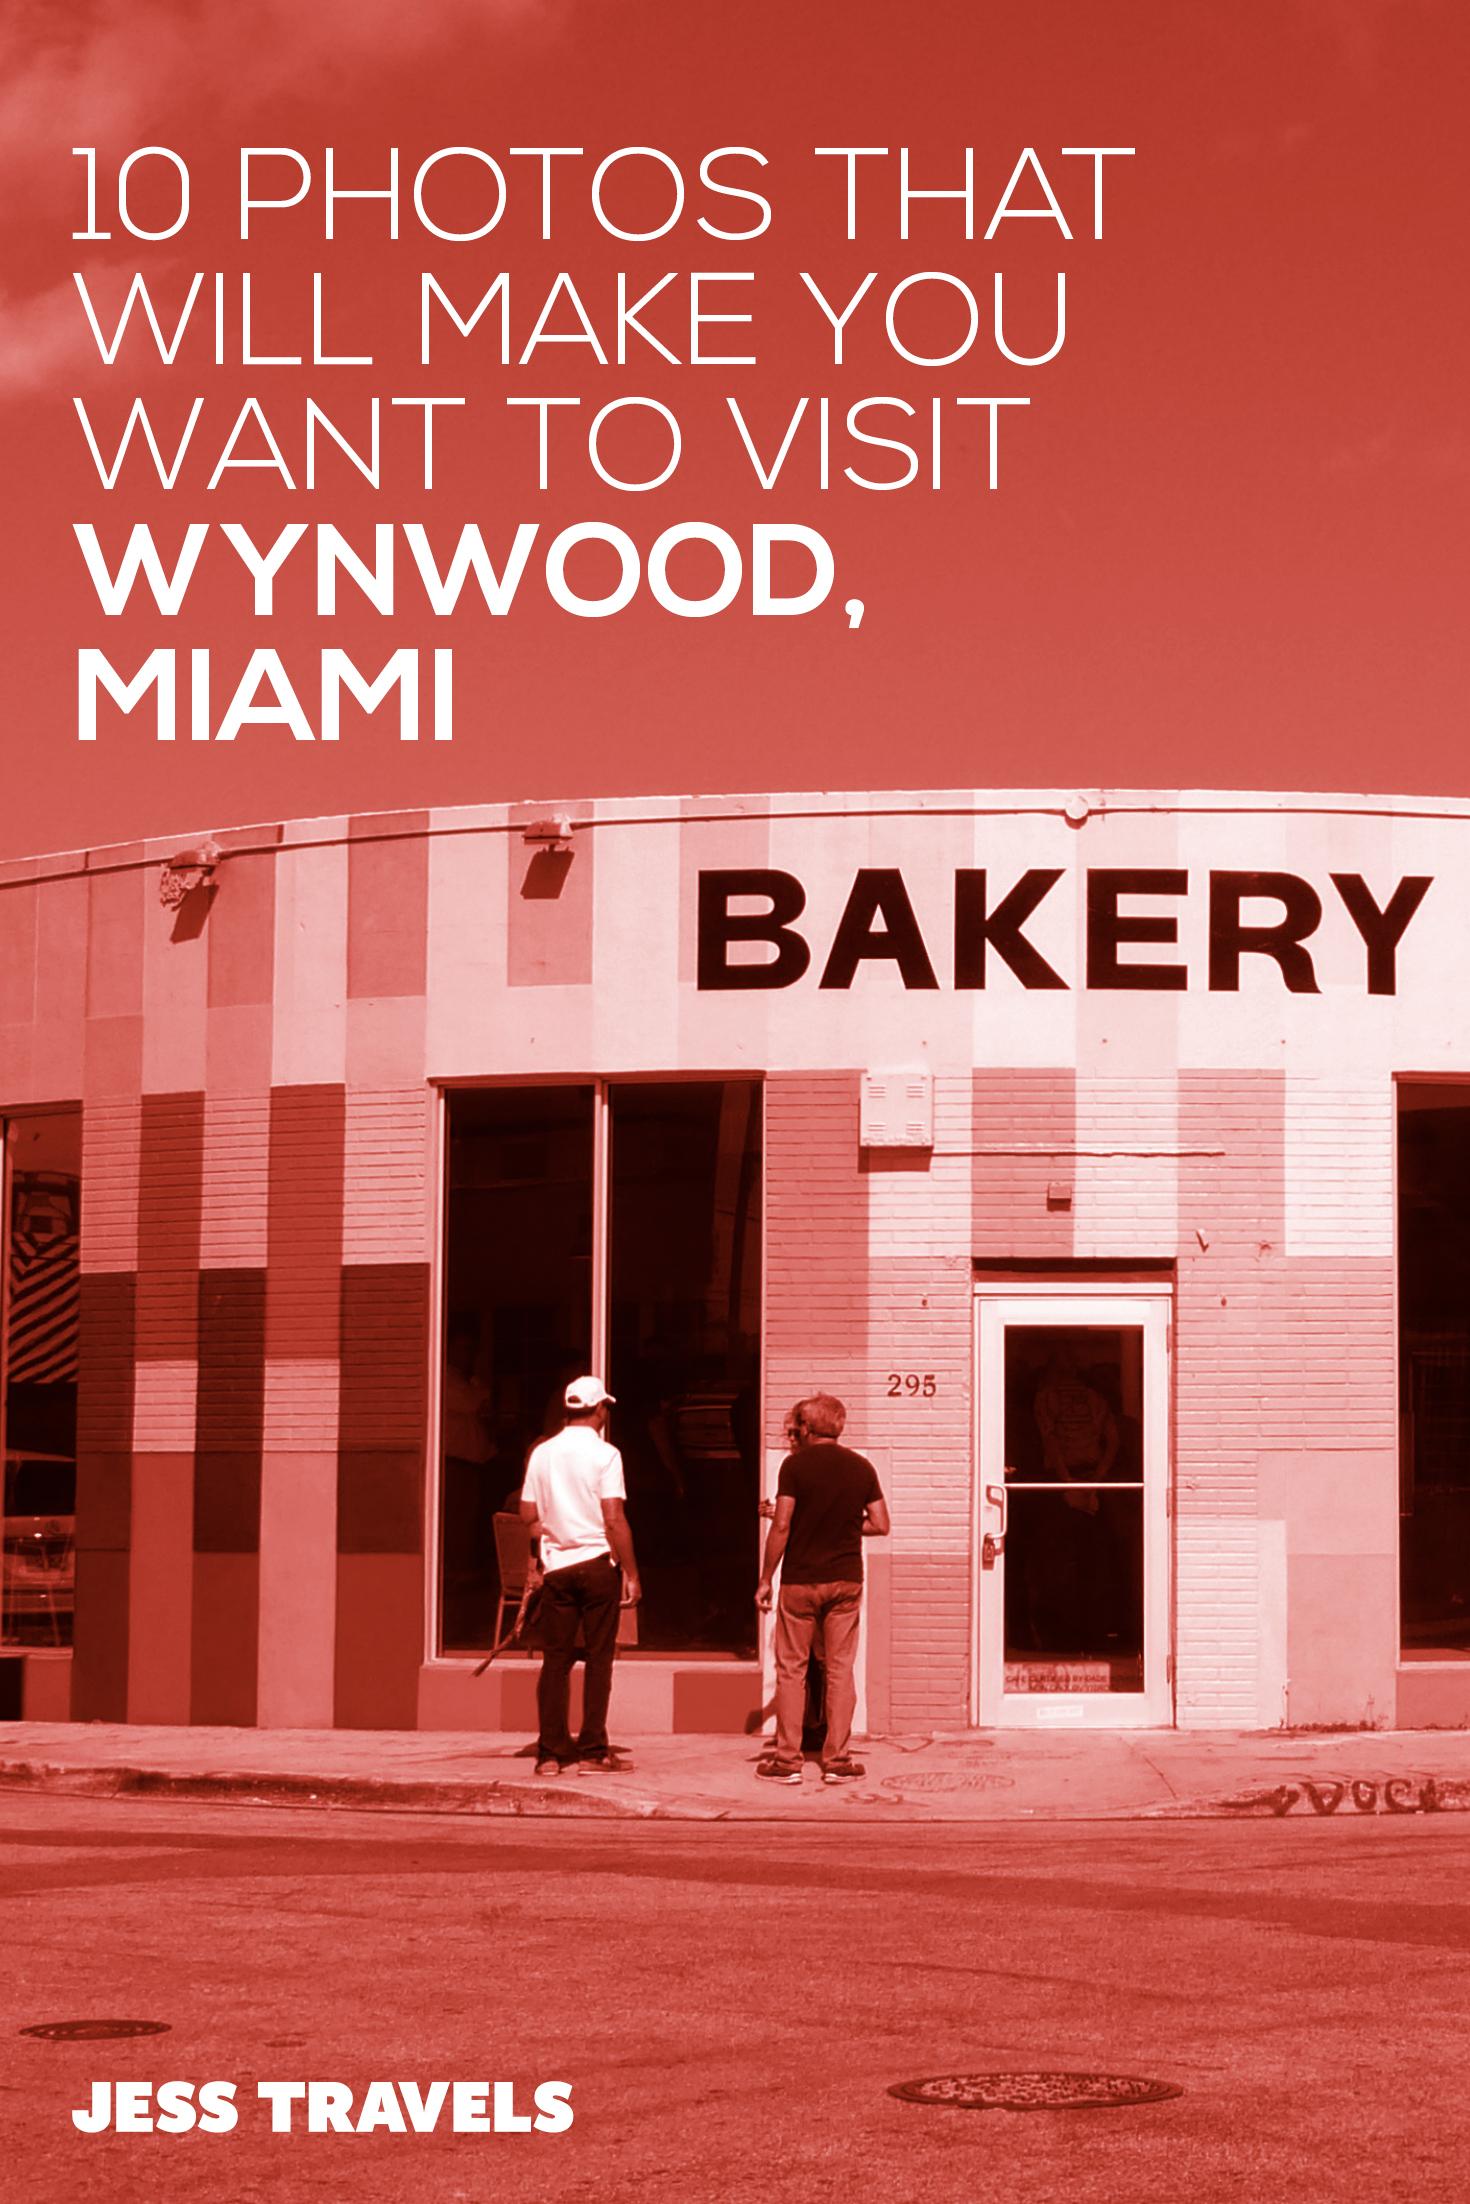 10 photos that will make you want to visit Wynwood Art District in Miami, Florida. USA travel ideas   Days out in Miami. #travelUSA #Miami